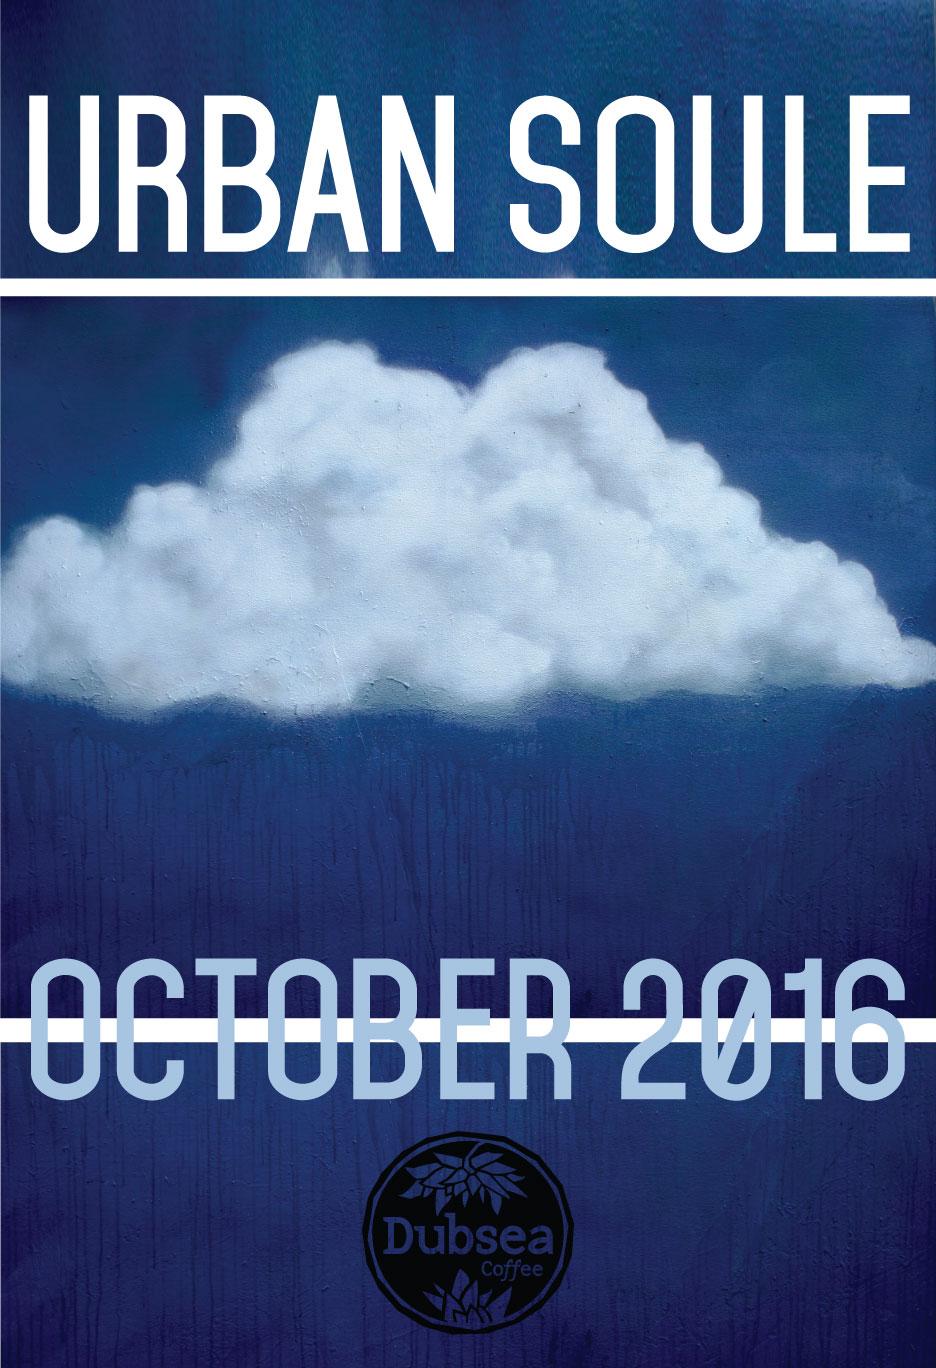 Urban-Soule-Poster.jpg